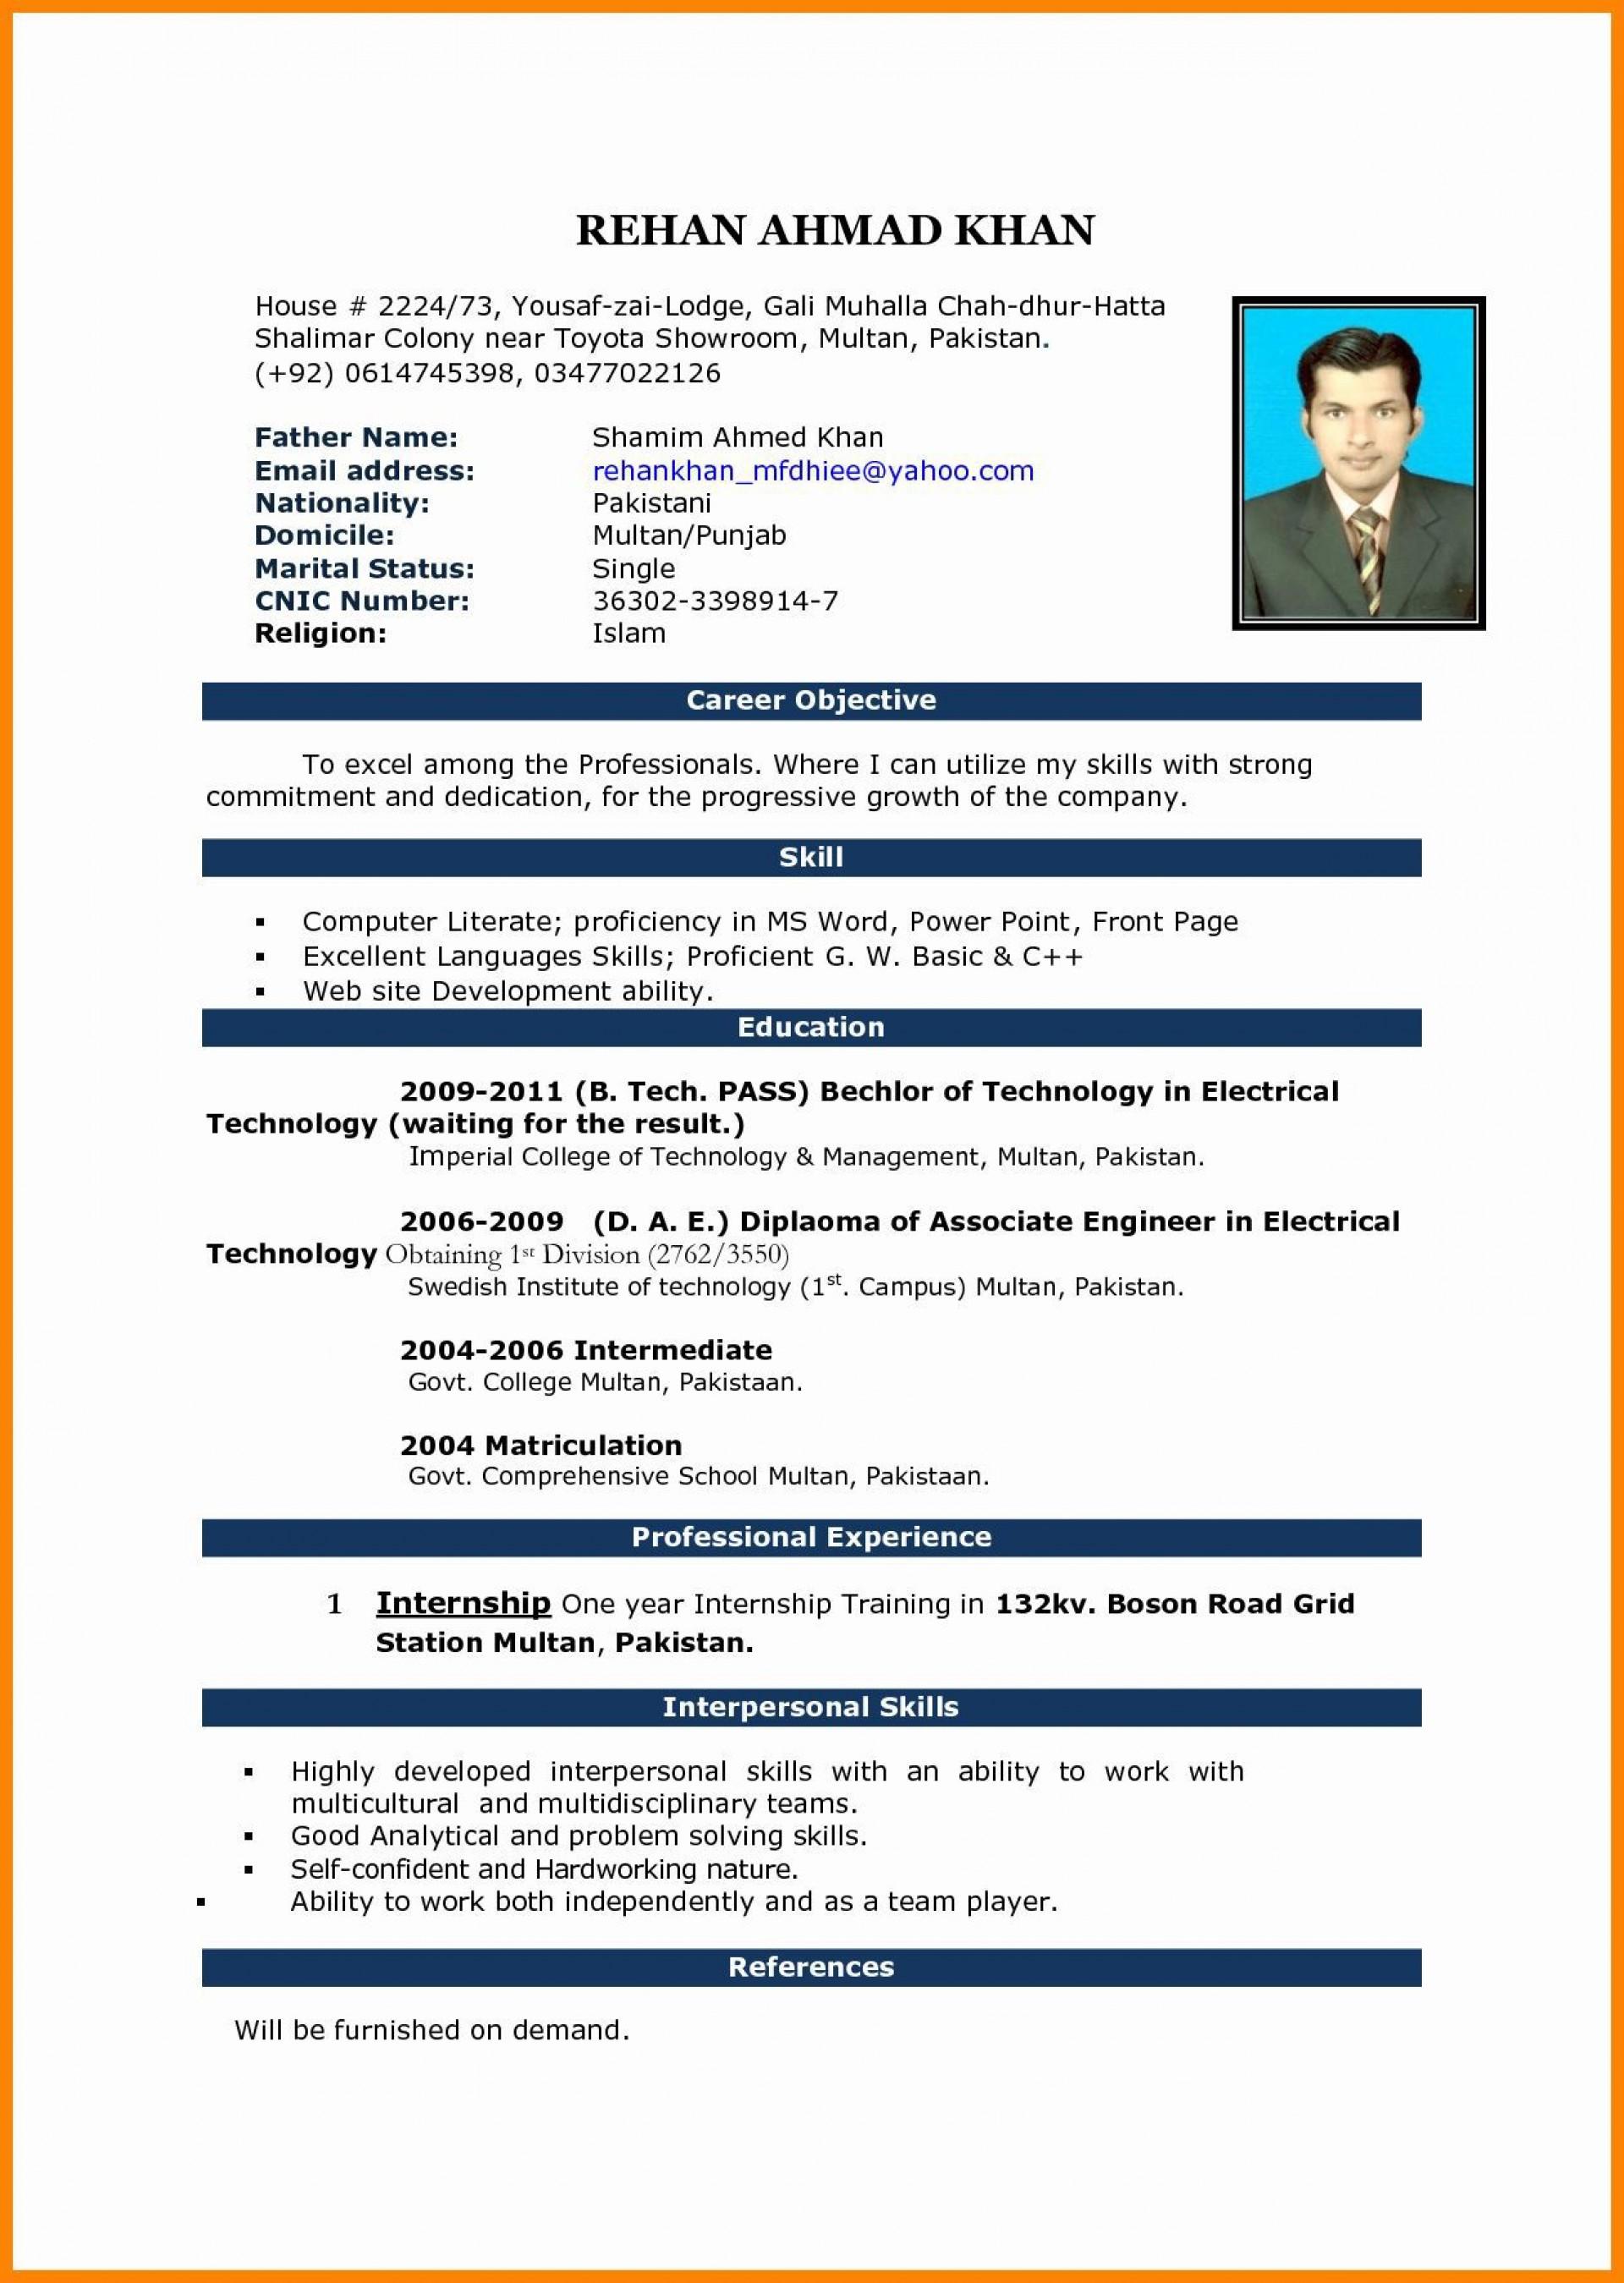 002 Phenomenal Free Resume Template Microsoft Word 2010 High Def  Cv Download1920